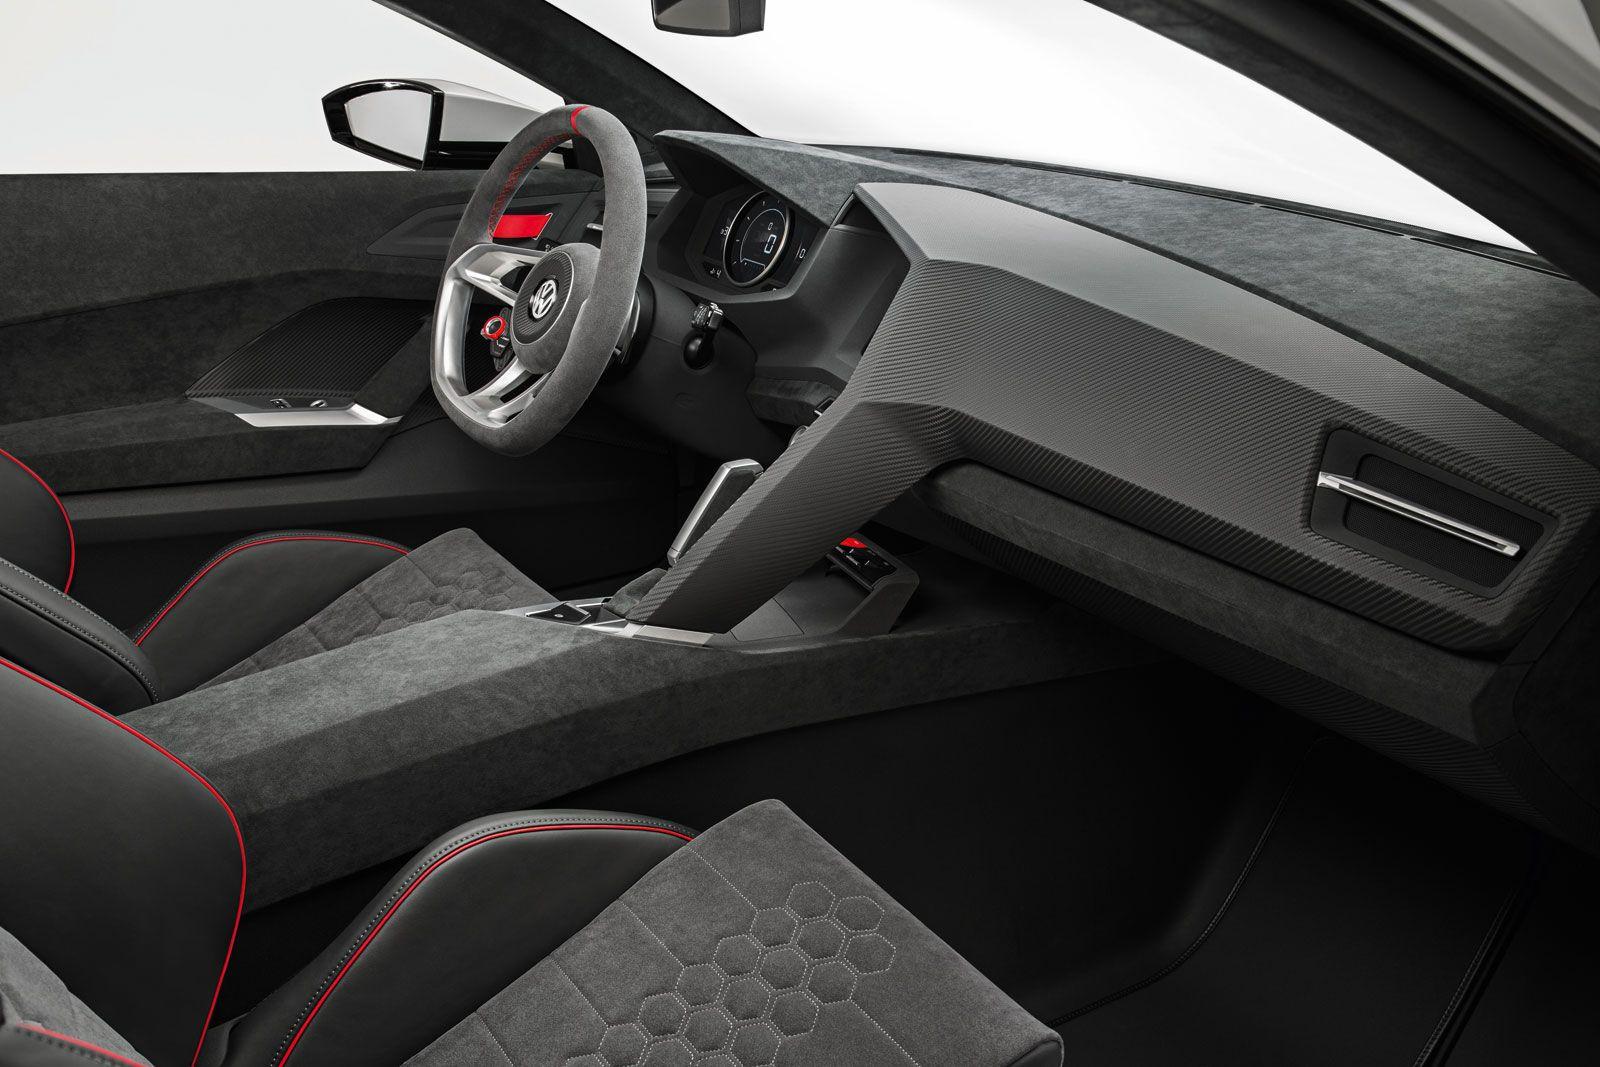 Volkswagen Design Vision Gti Concept Interior Car Body Design Volkswagen Volkswagen Interior Gti Car